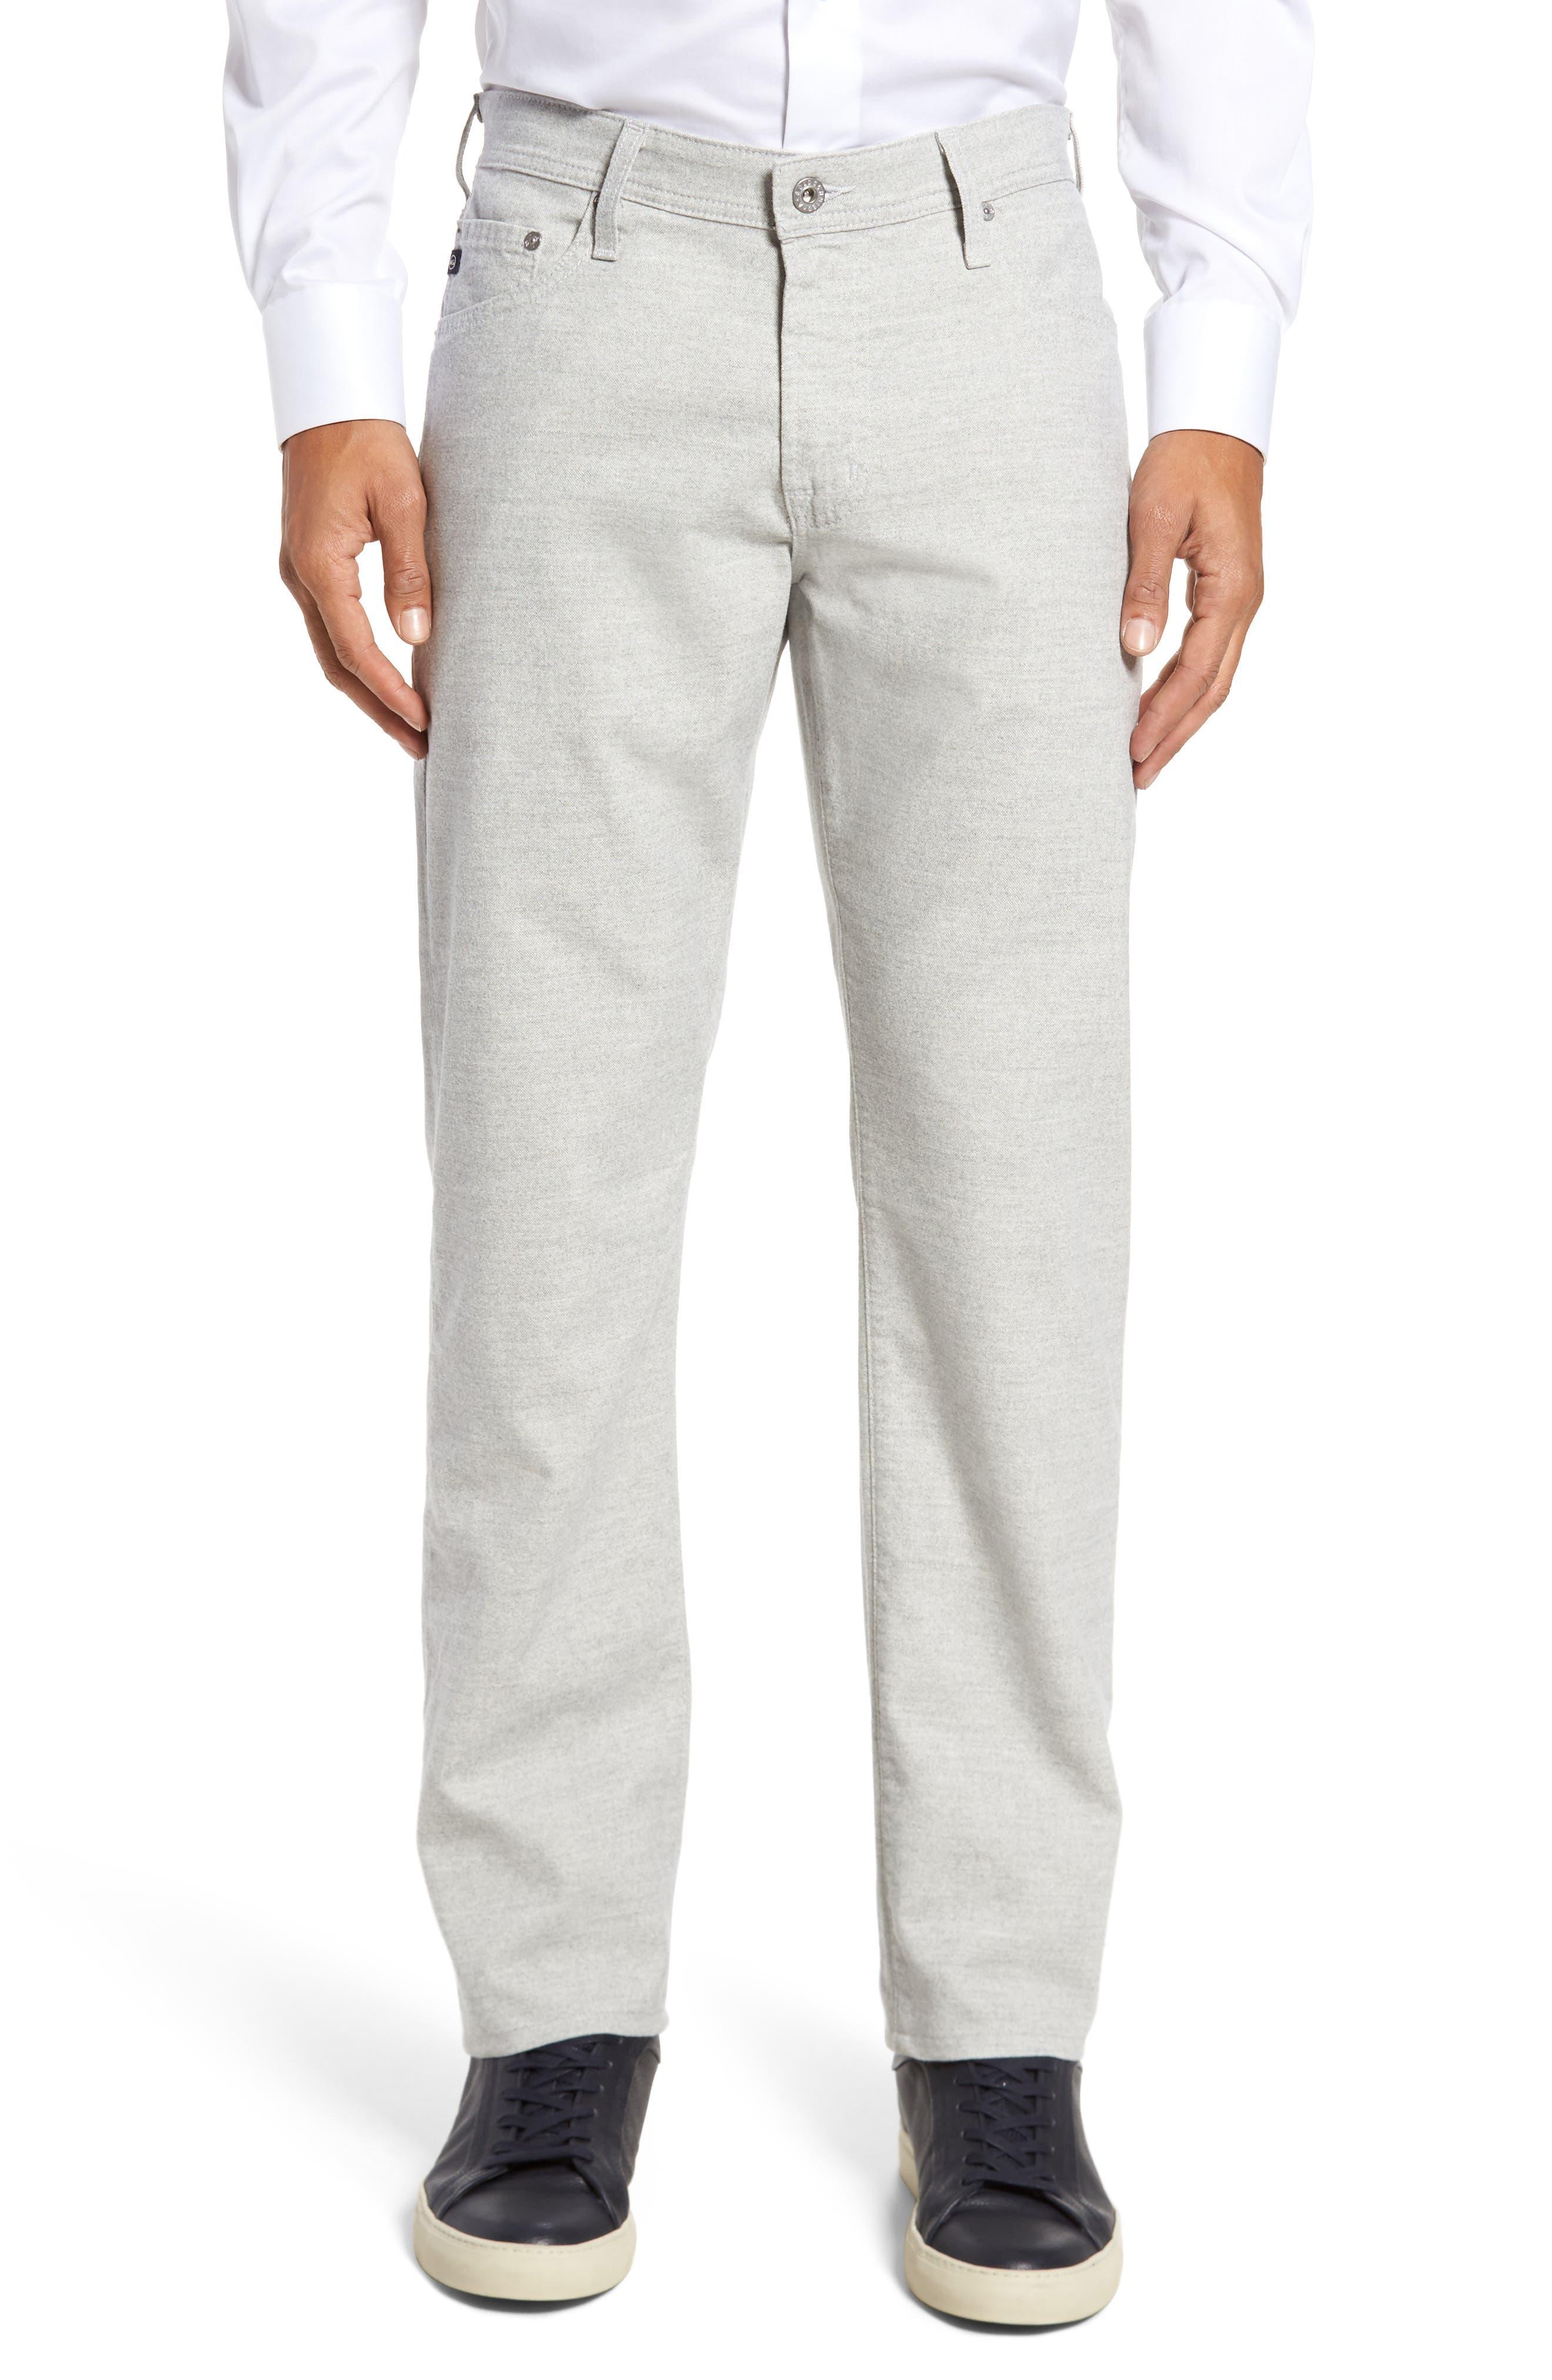 Graduate Tailored Five-Pocket Straight Leg Pants,                         Main,                         color, 020